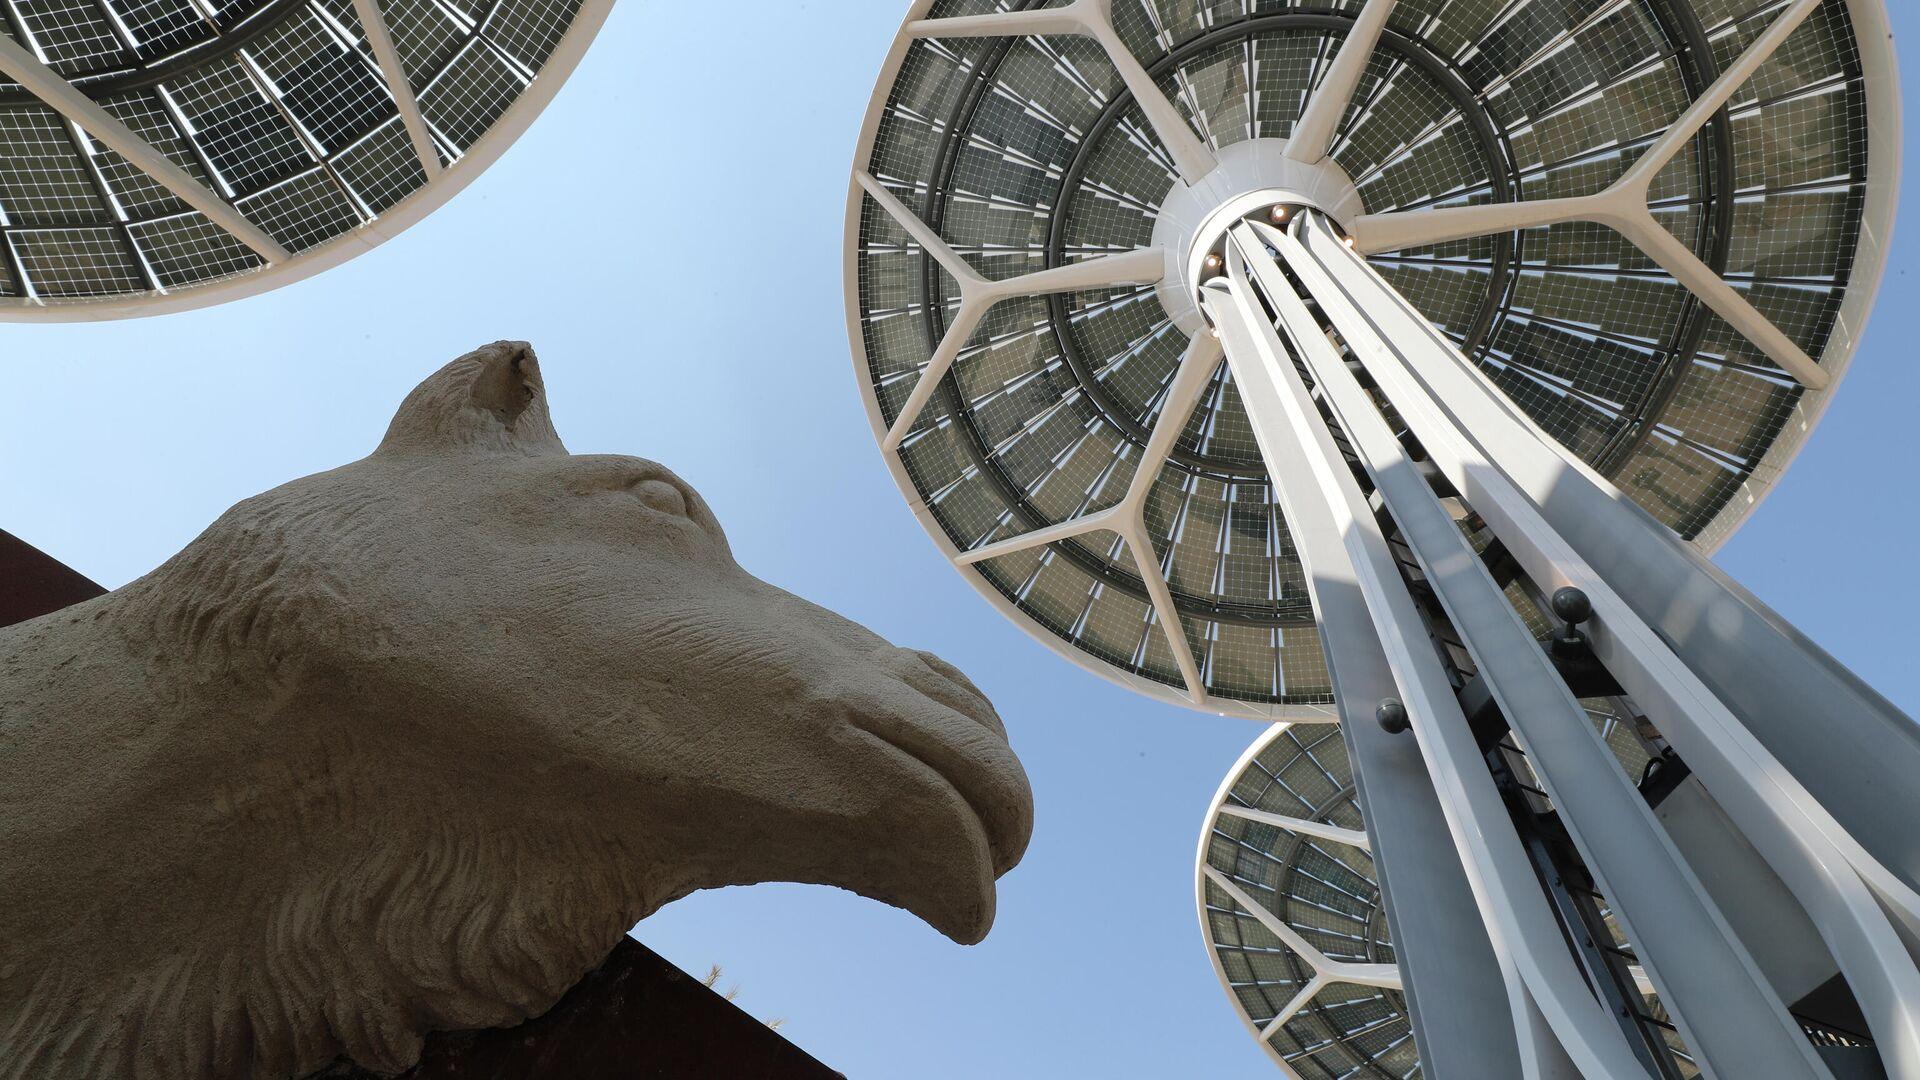 Unos árboles de energía  en Terra, in pabellón de la Exposición Universal de Dubái, Emiratos Árabes Unidos. - Sputnik Mundo, 1920, 23.09.2021